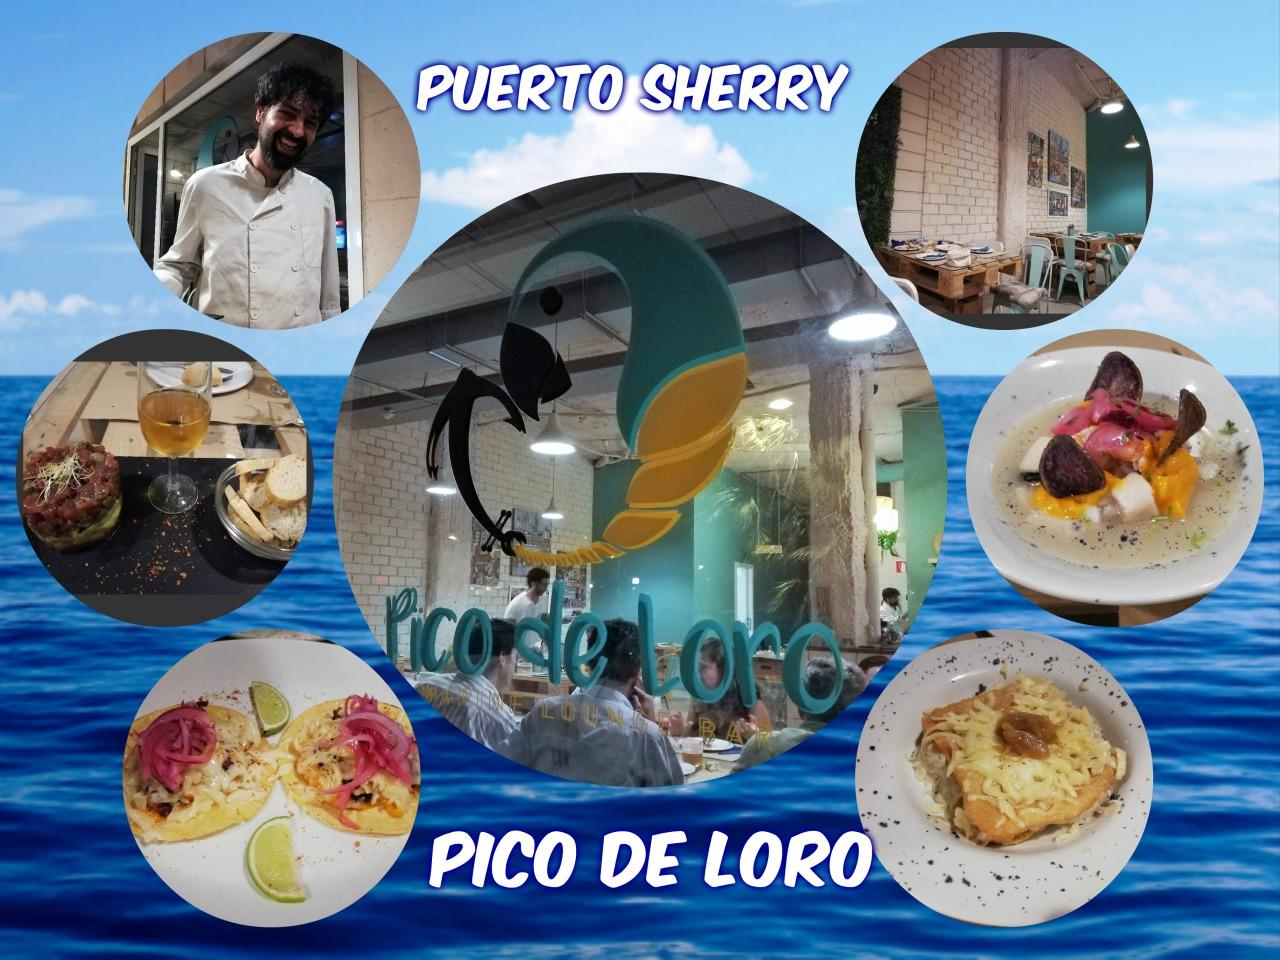 Discover Sherry recommends: Pico de Loro en PuertoSherry